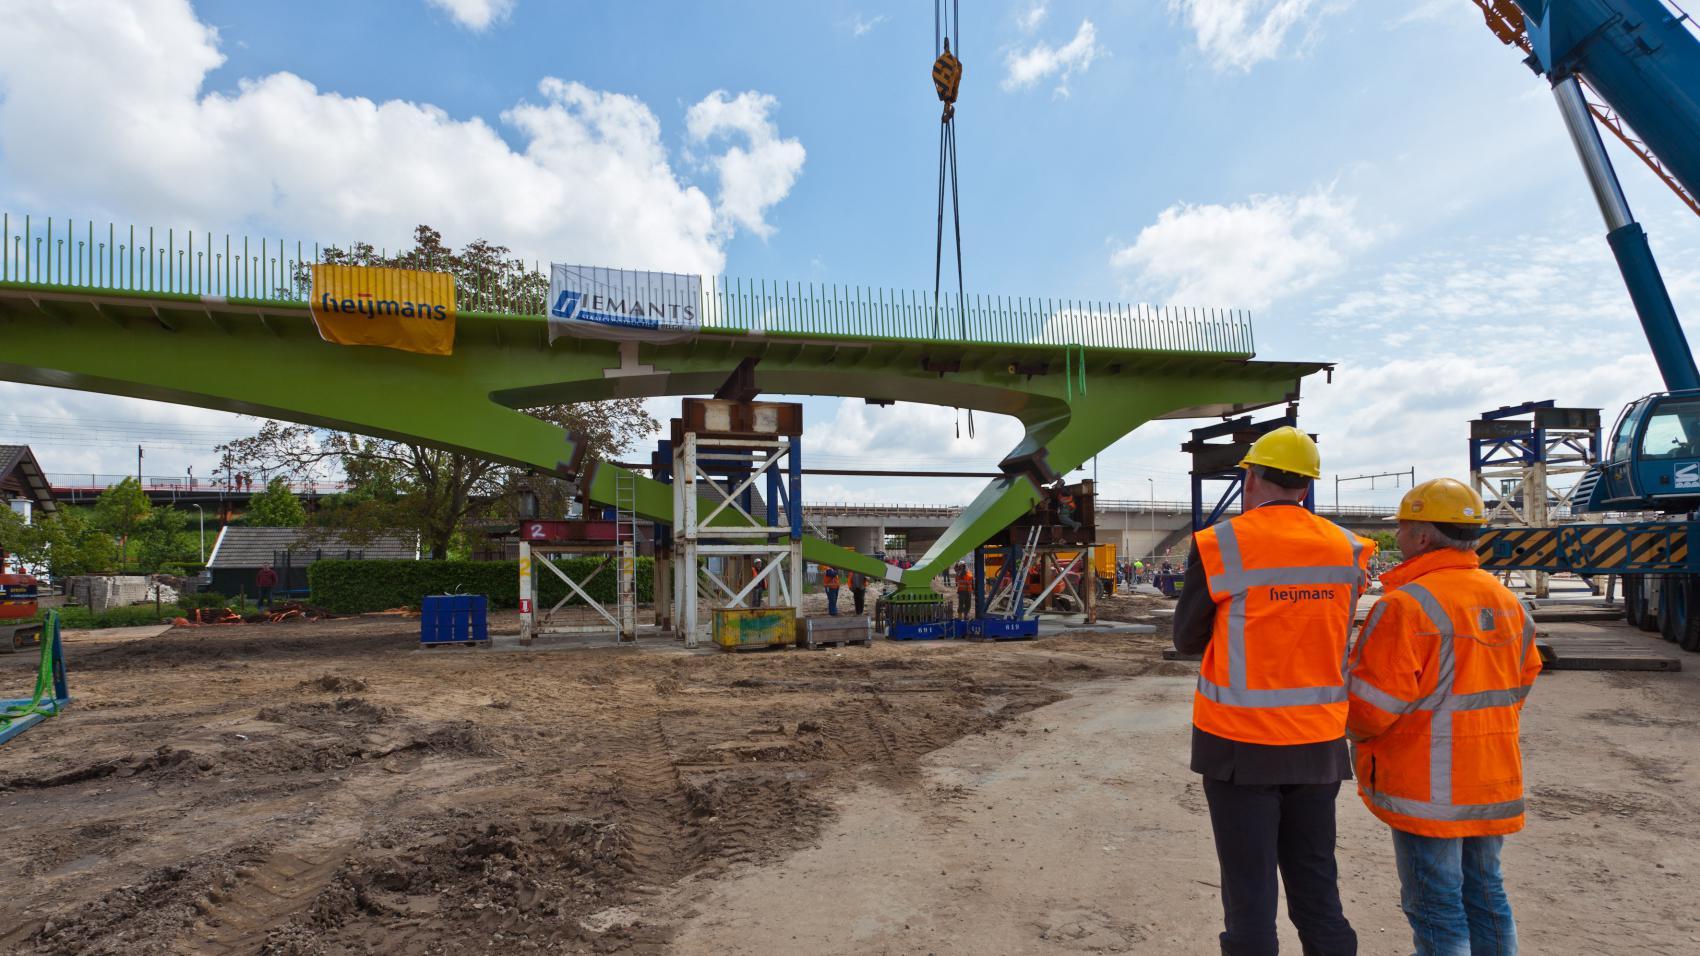 Het Grontje under construction. Photo credit: Province Gelderland.